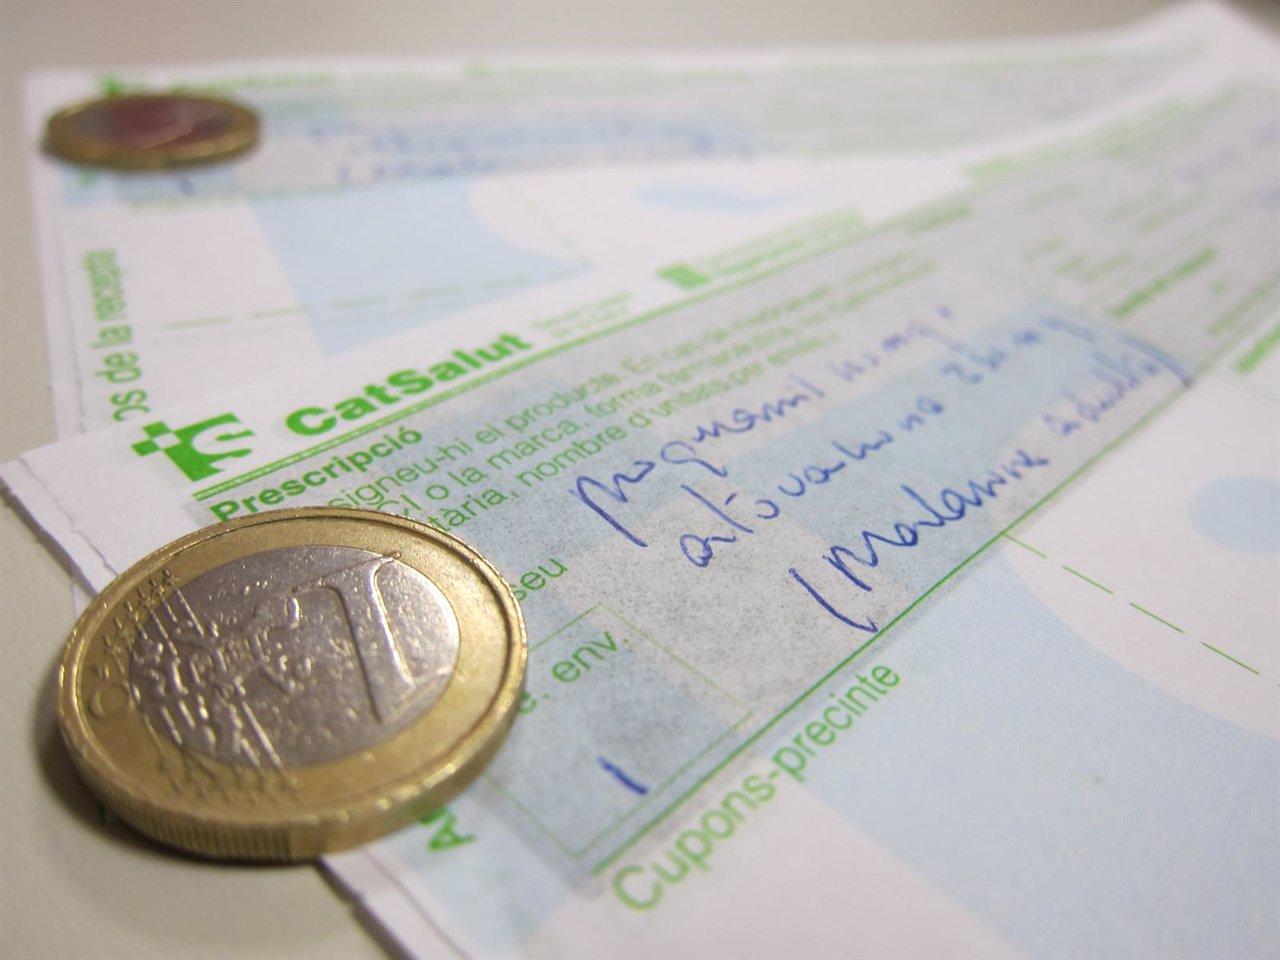 Tasa De Un Euro Por Receta. Receta. Recetas.